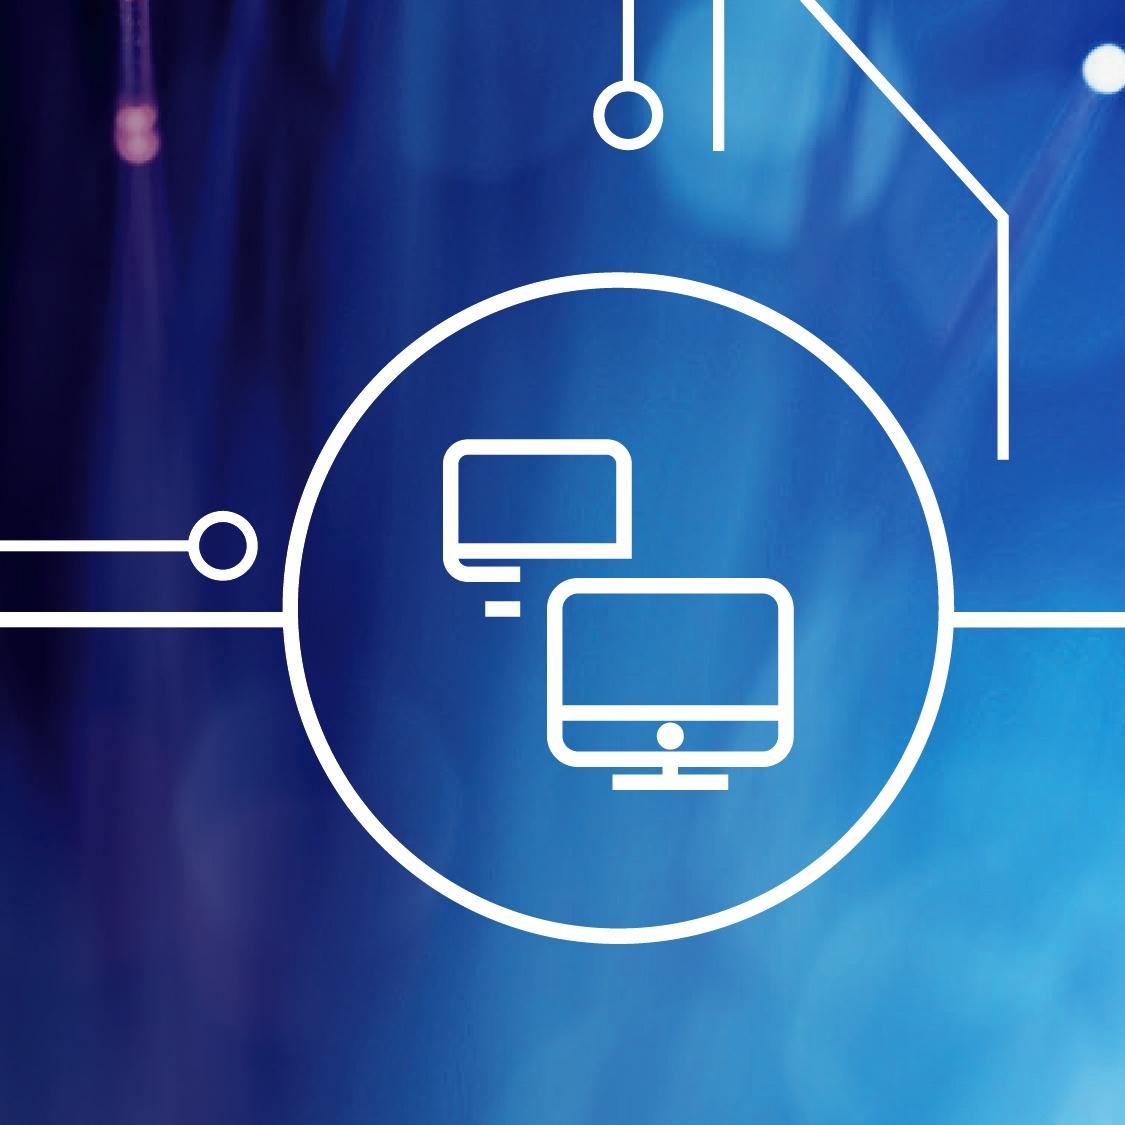 Enterprise Tech front cover image.jpg